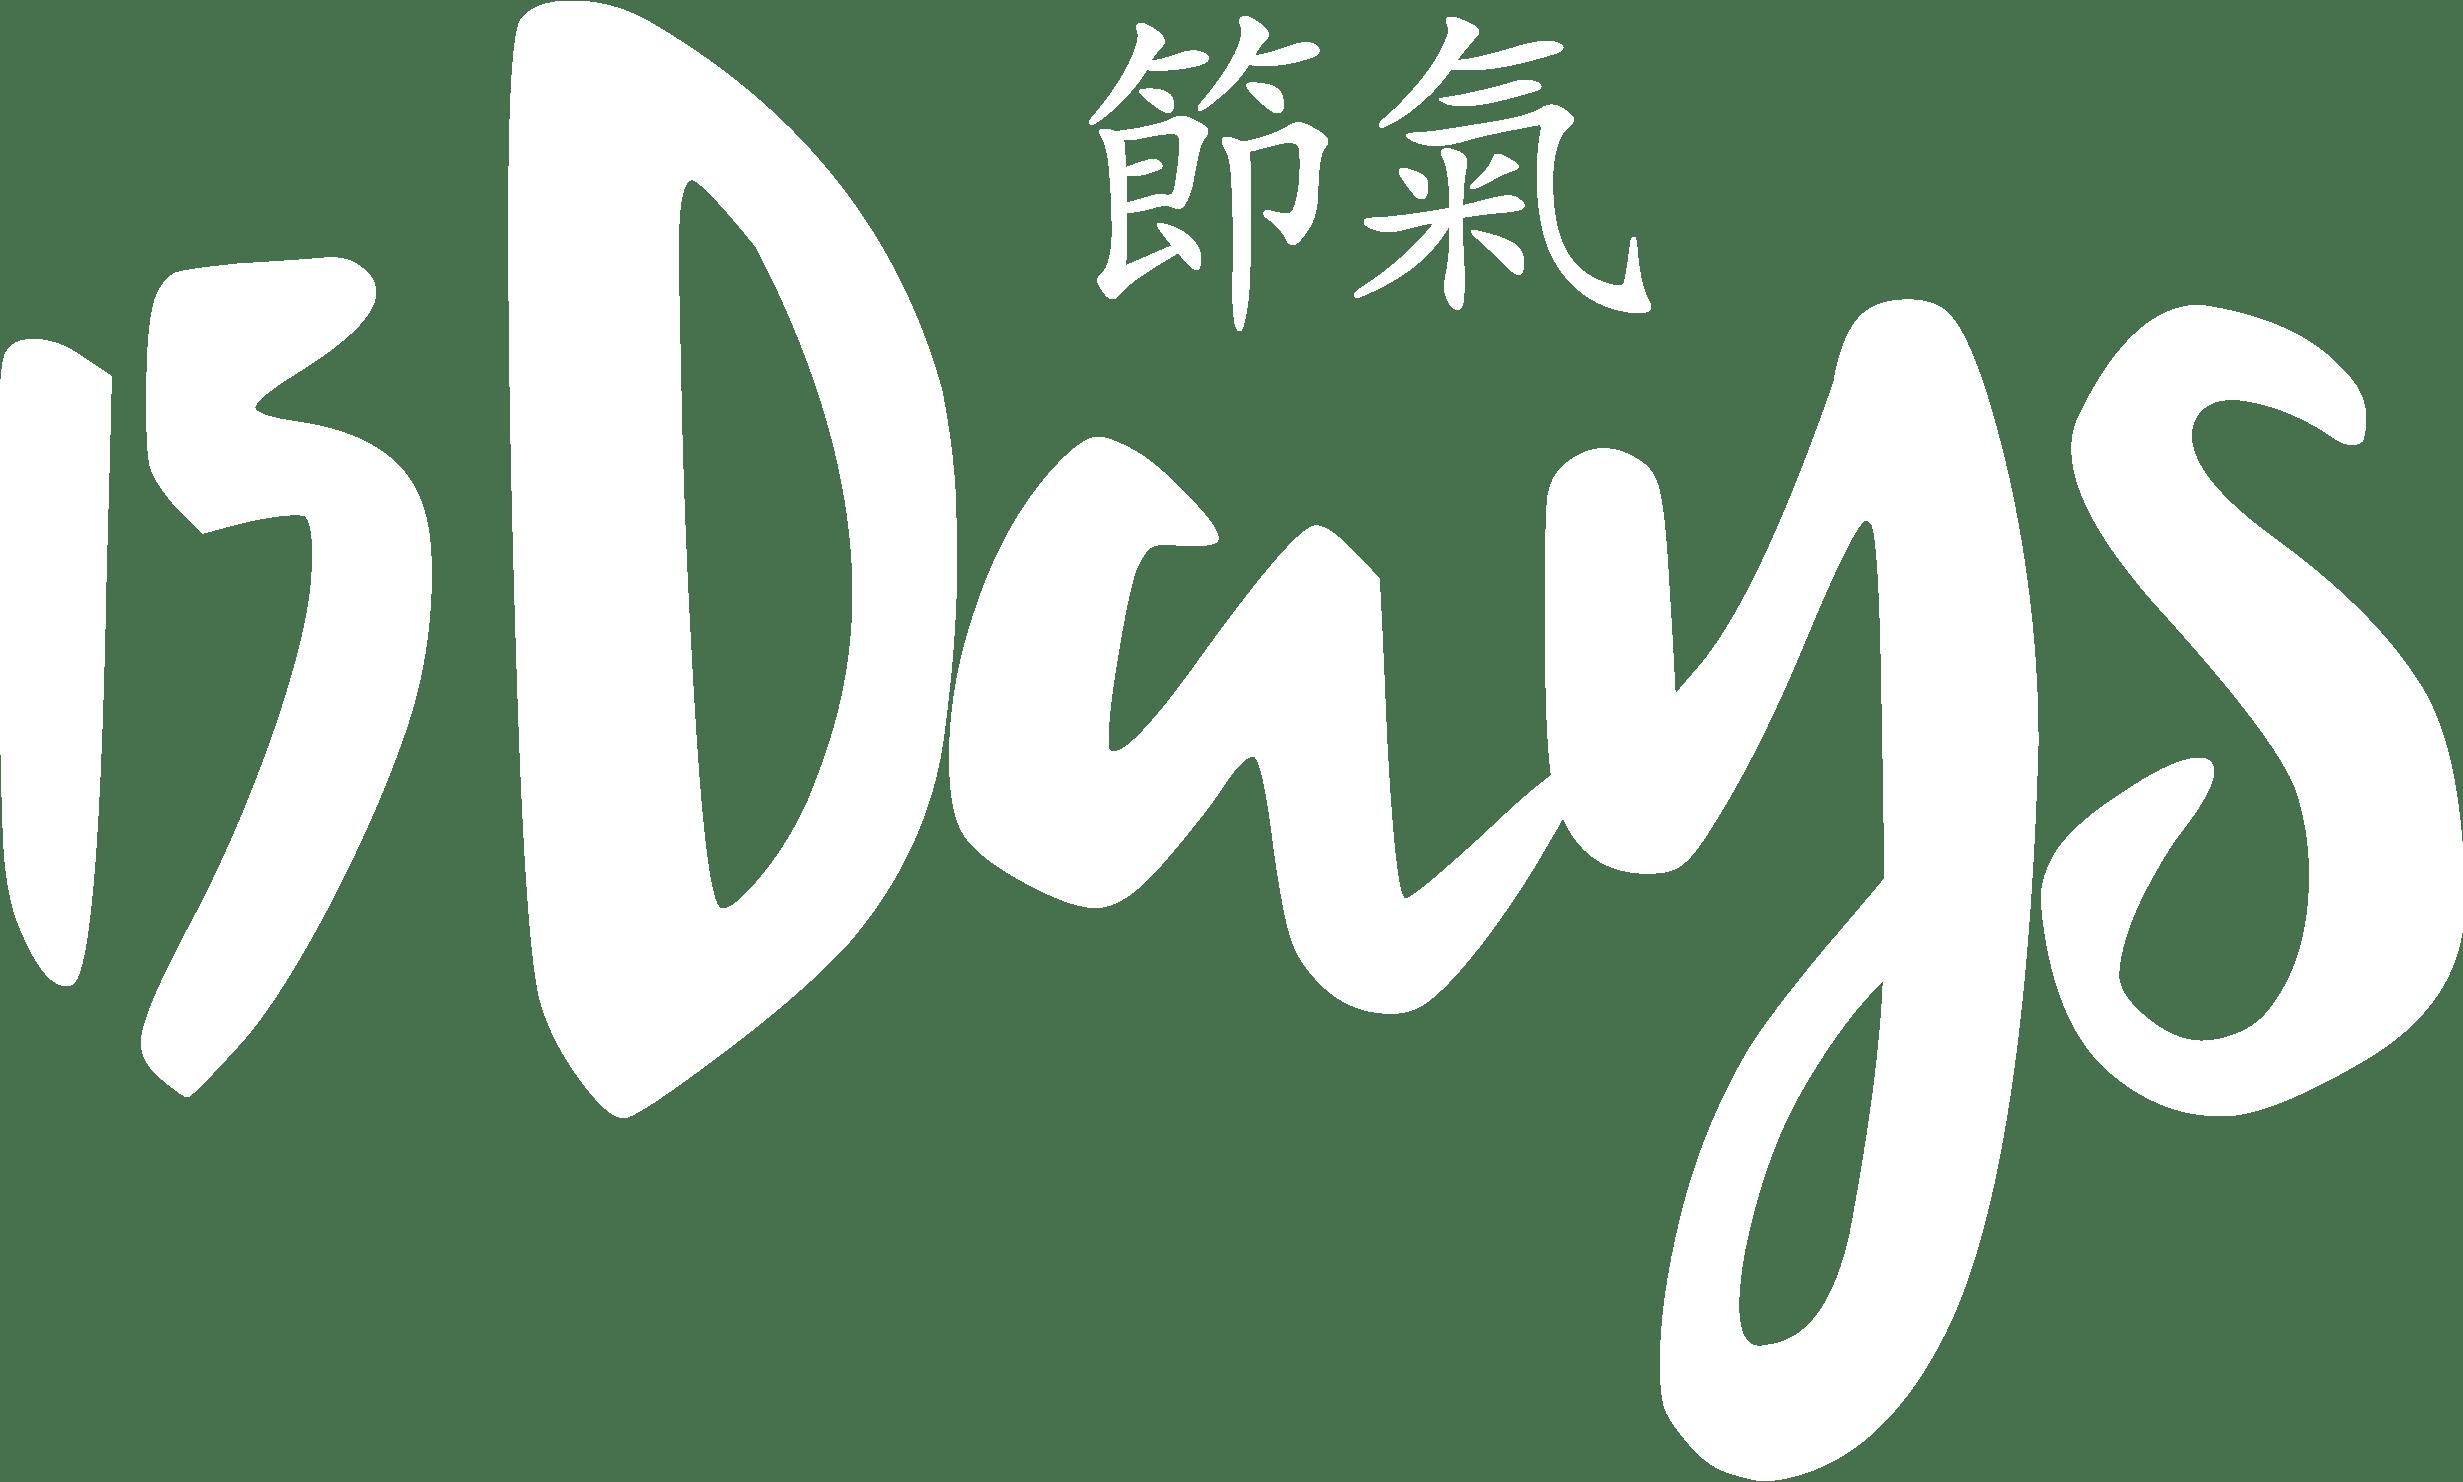 15 Days Logo